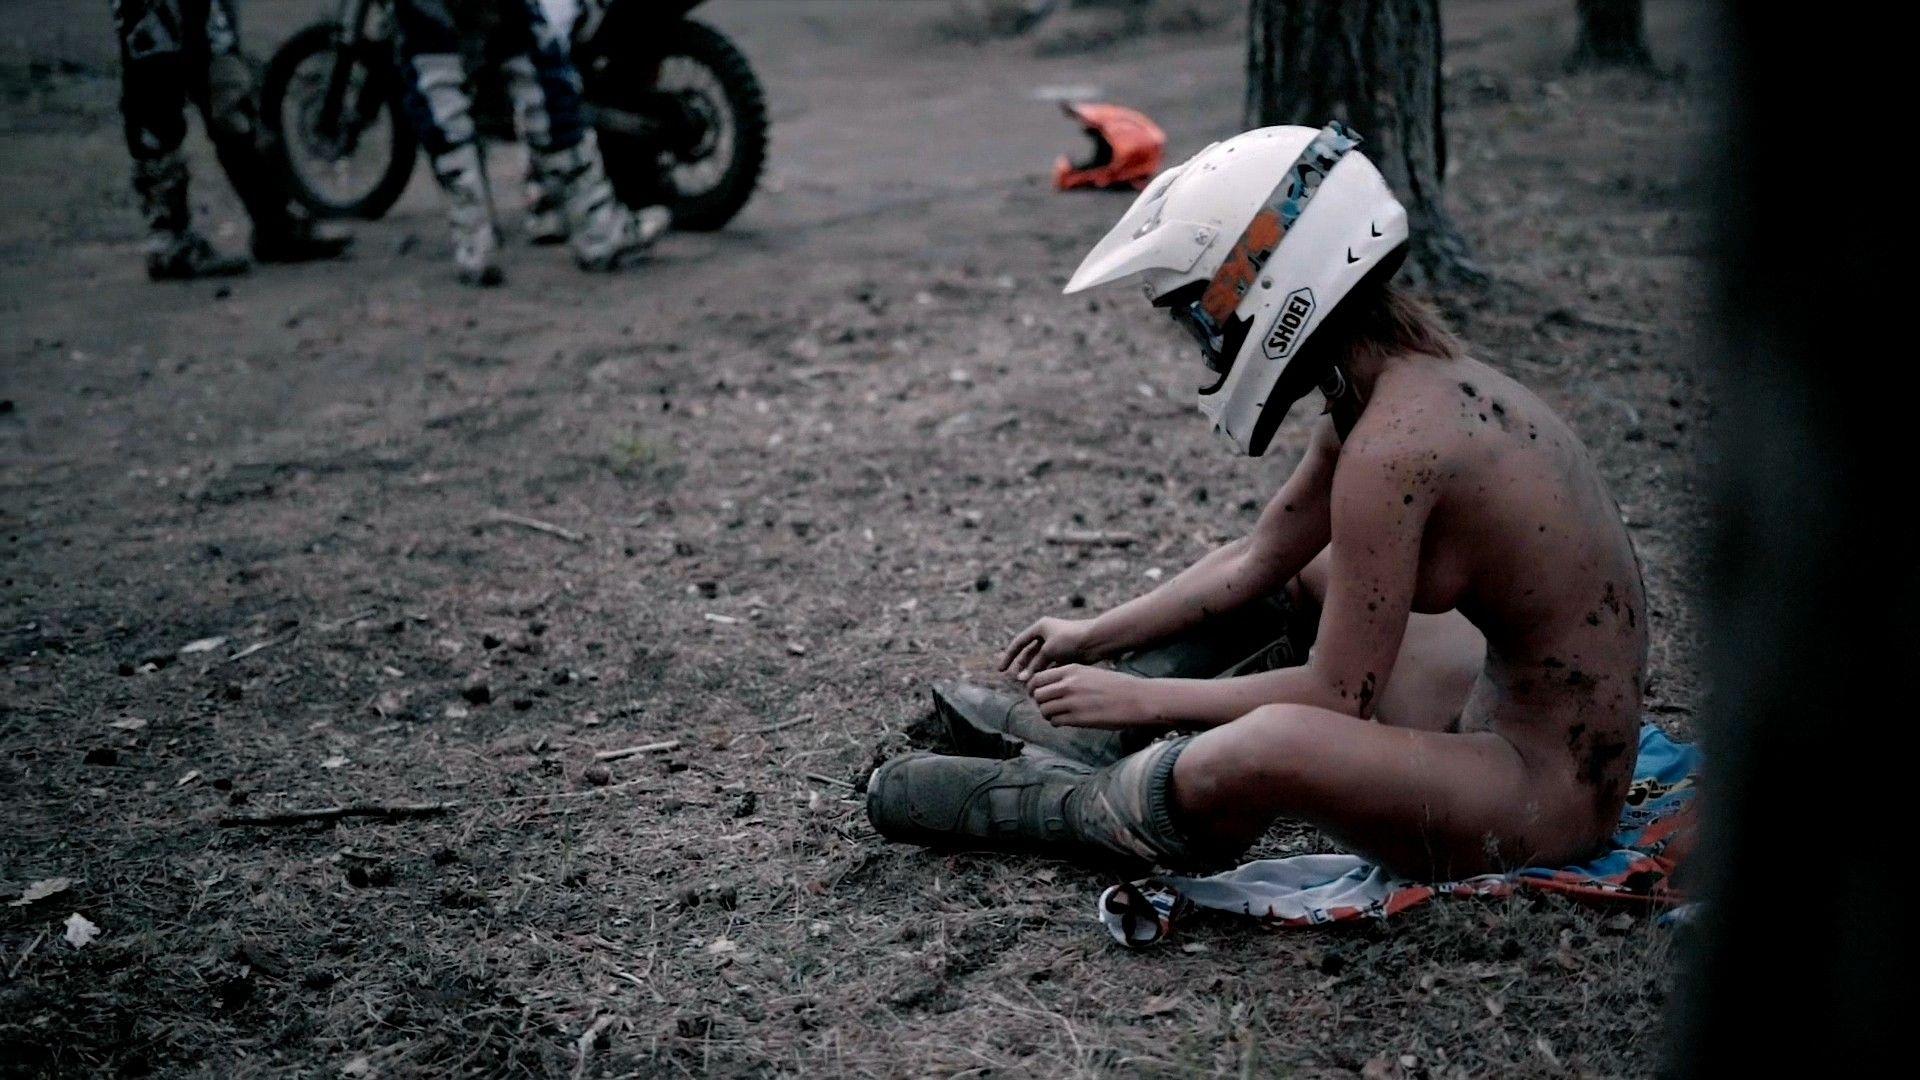 marisa-papen-nude-bts-thefappeningBlog-12.jpg